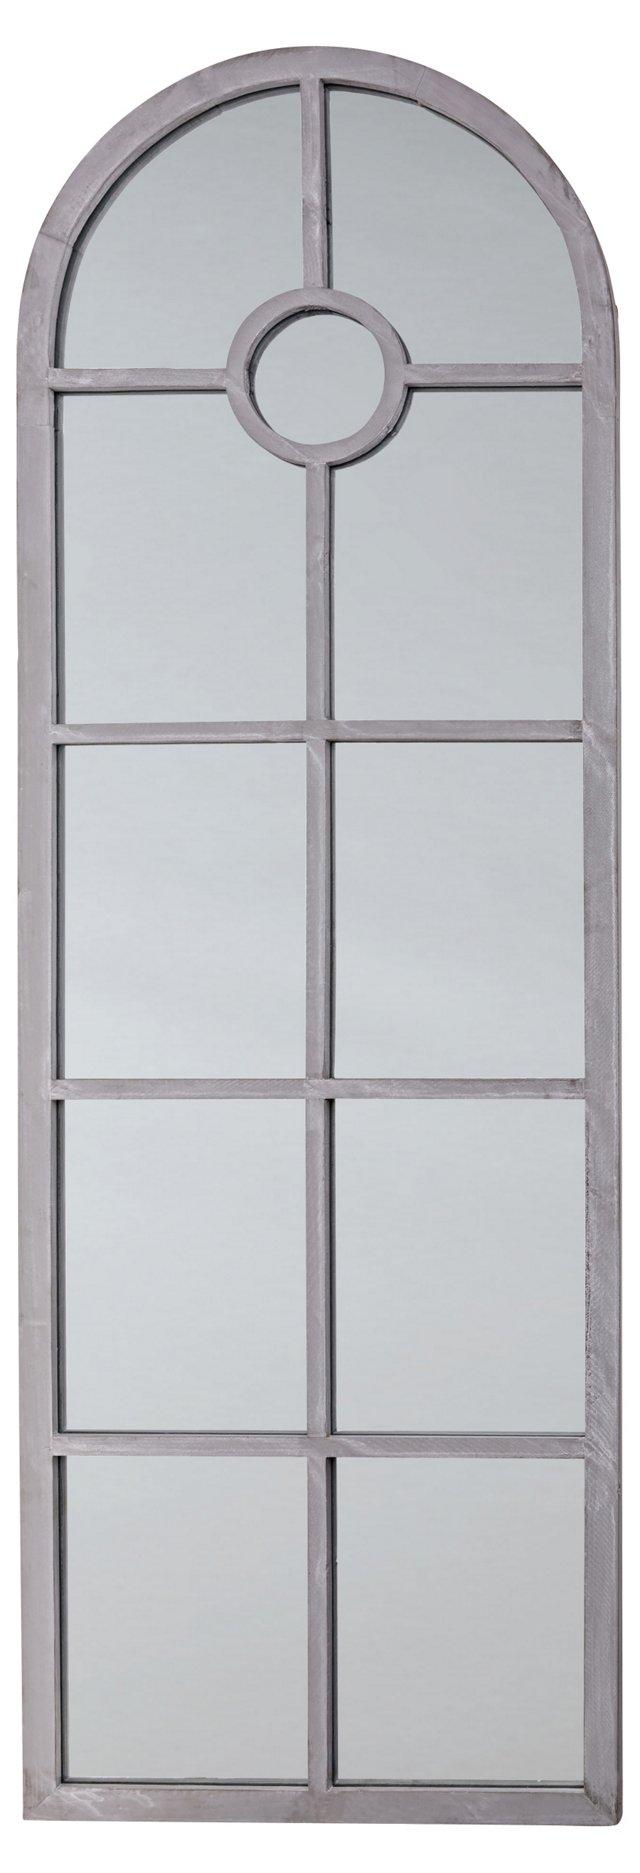 Rosen Floor Mirror, Gray